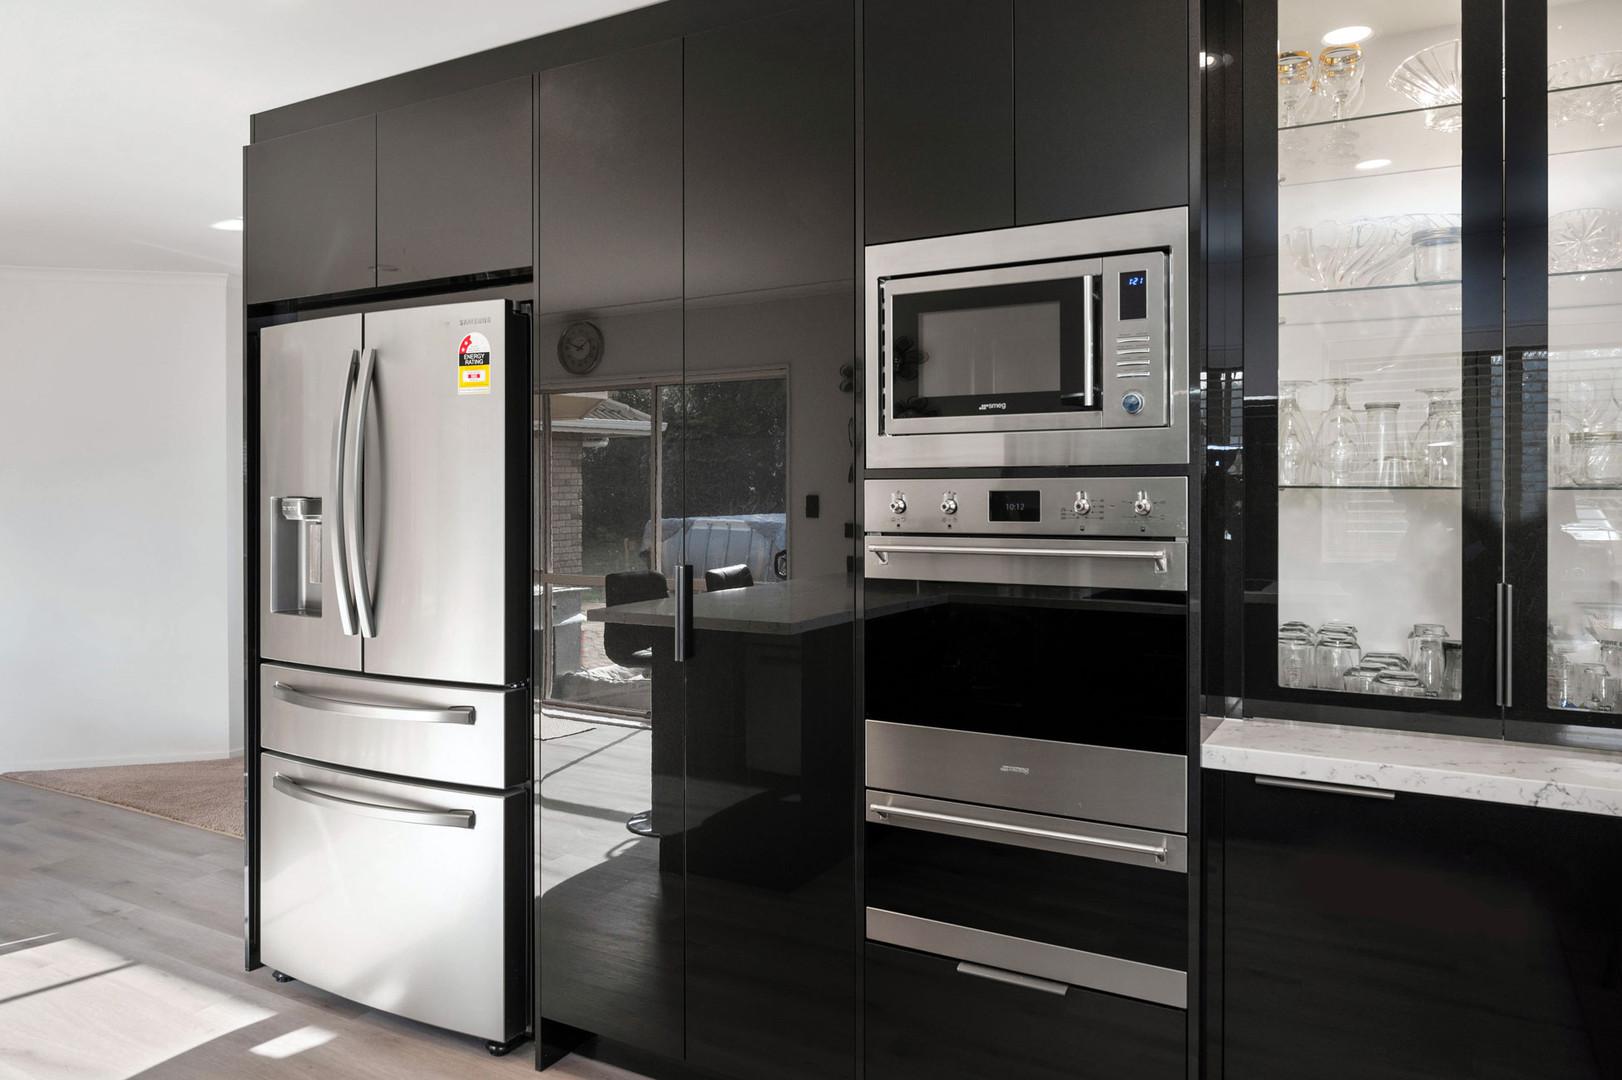 ID487018-Brunswick_fridge.jpg